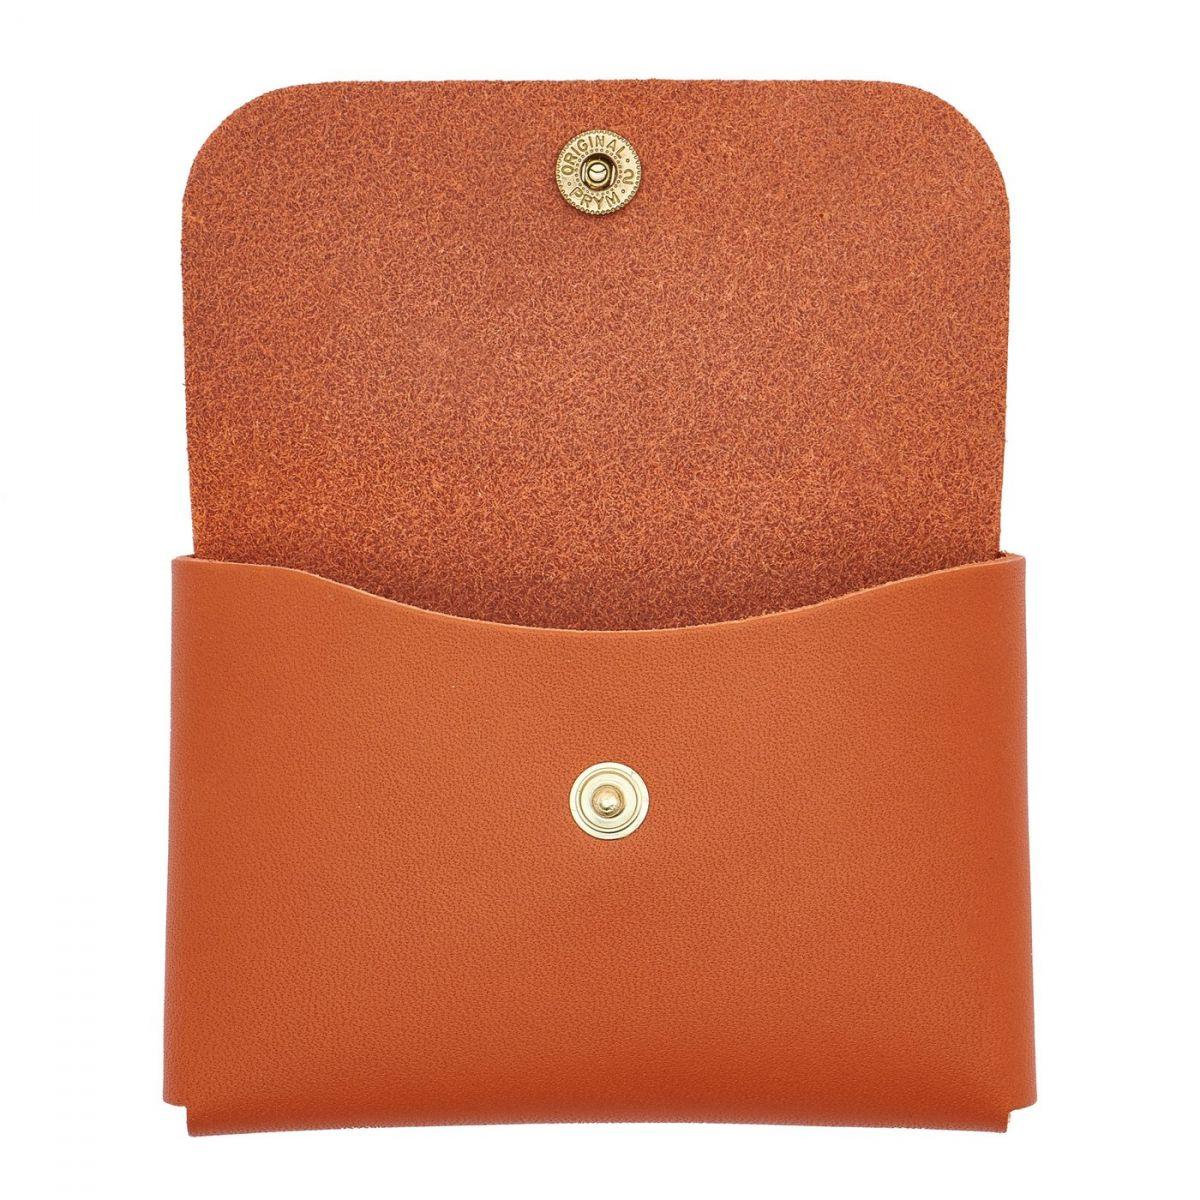 Card Case in Cowhide Double Leather color Orange - SCC032 | Details